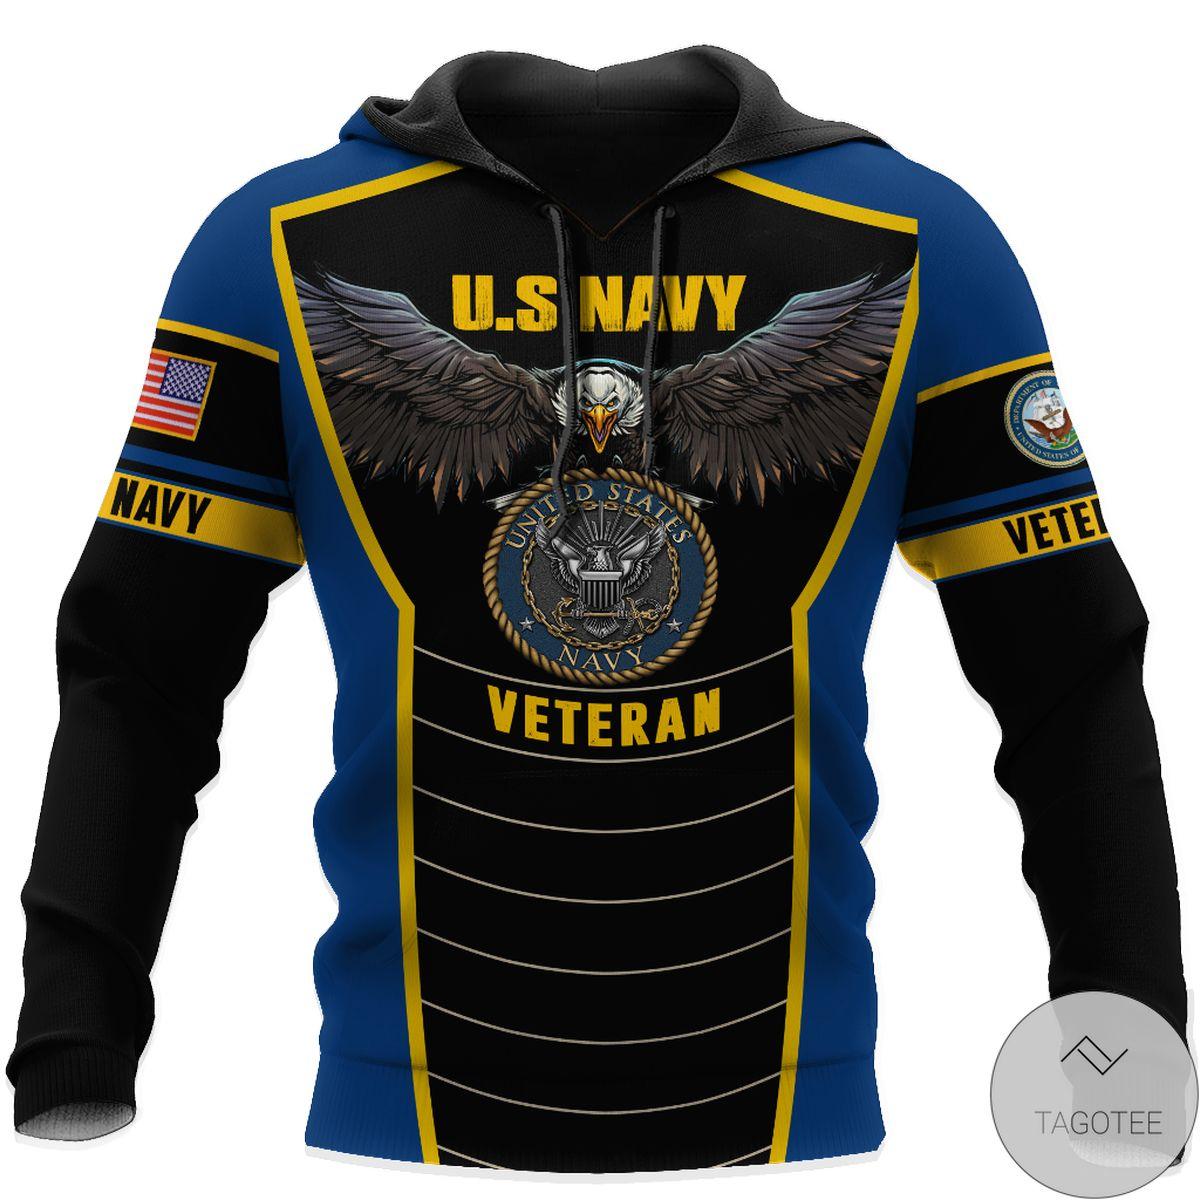 Hot Deal U.s Navy Veteran Eagle Pride Design 3D All Over Print Hoodie